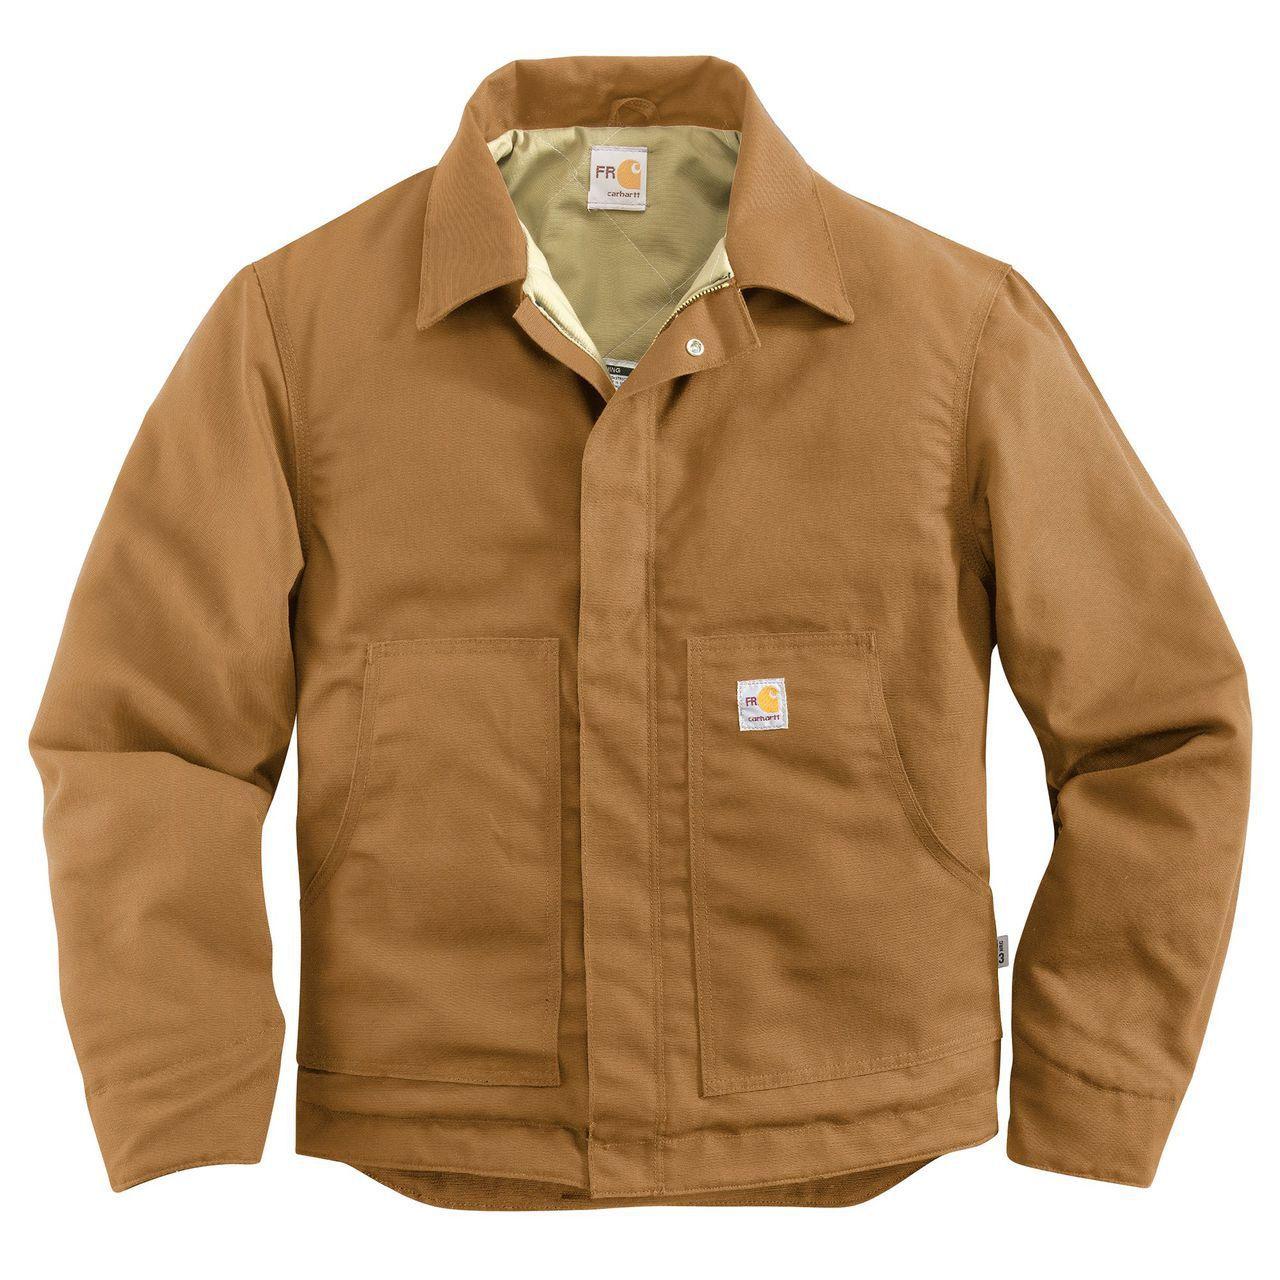 fabd6e343d59 Fr mw canvas dearborn jacket